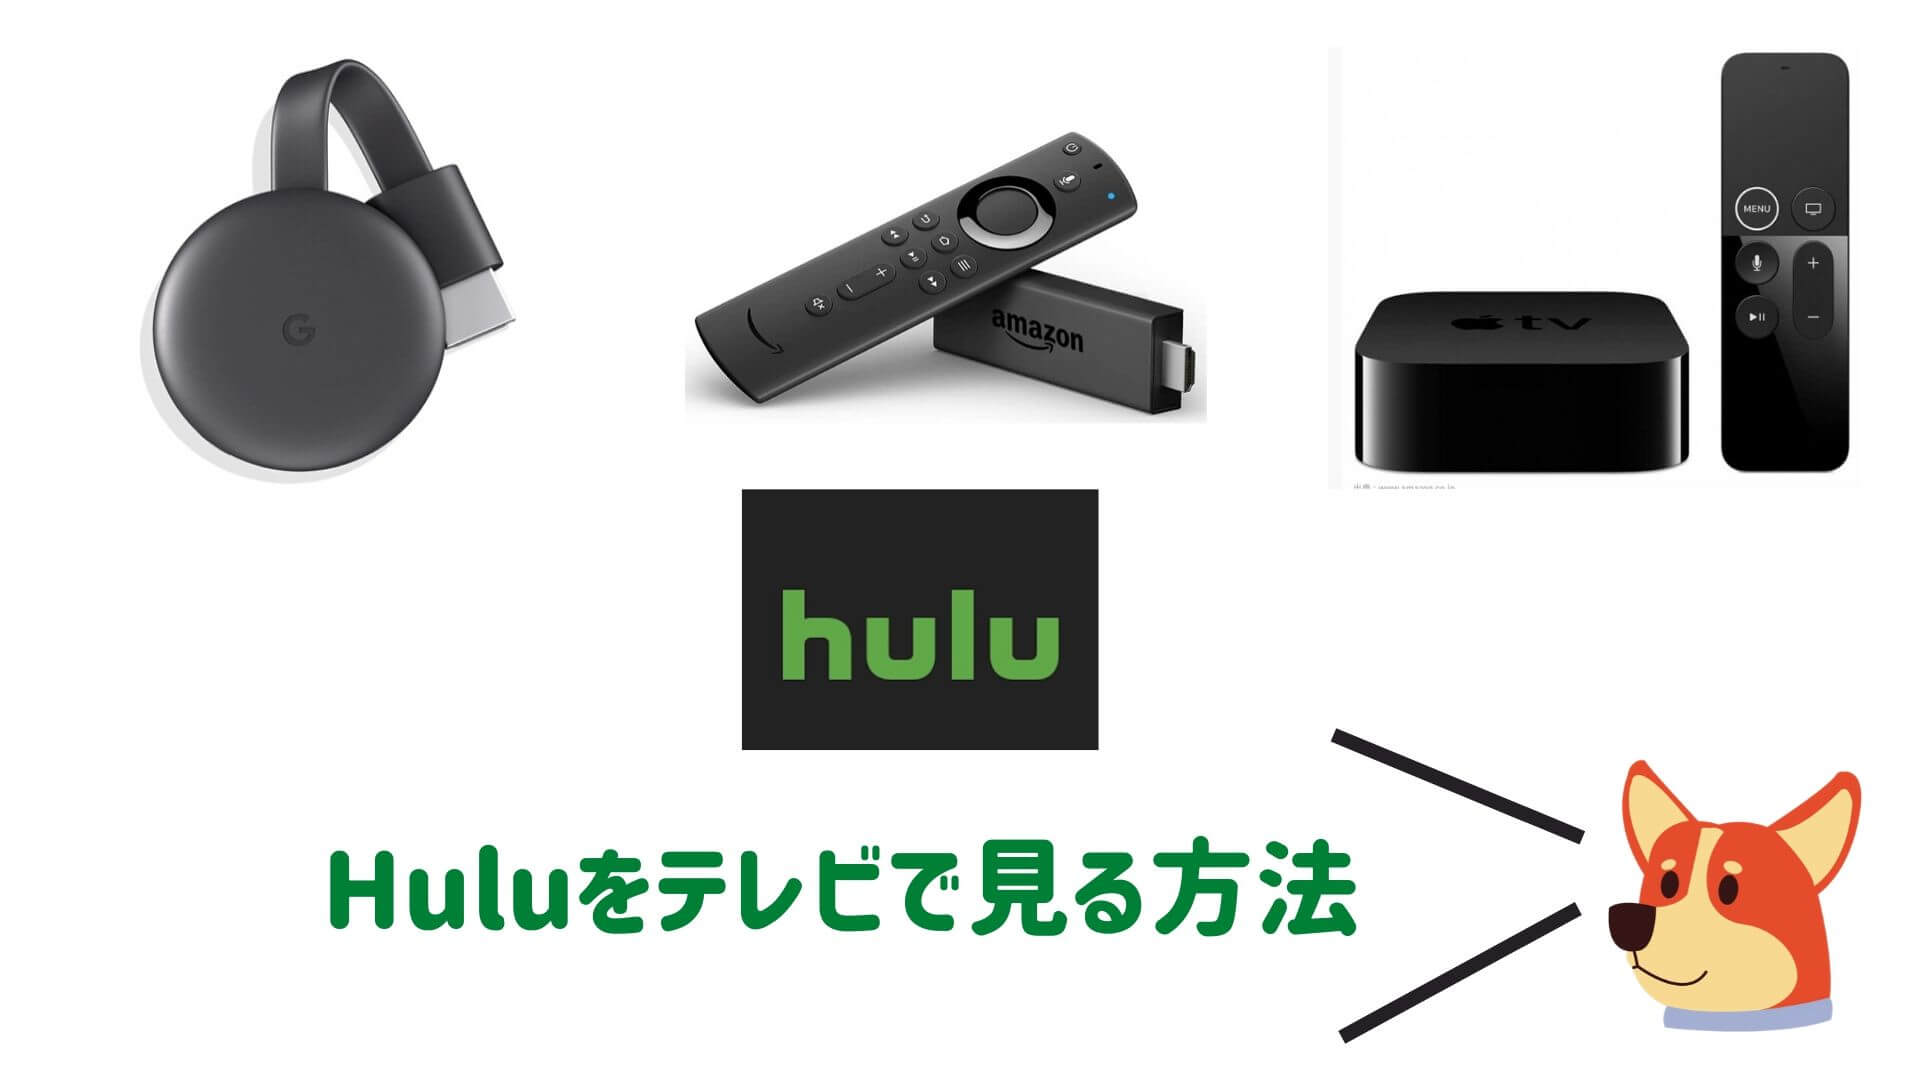 Huluをテレビで見る方法を説明している